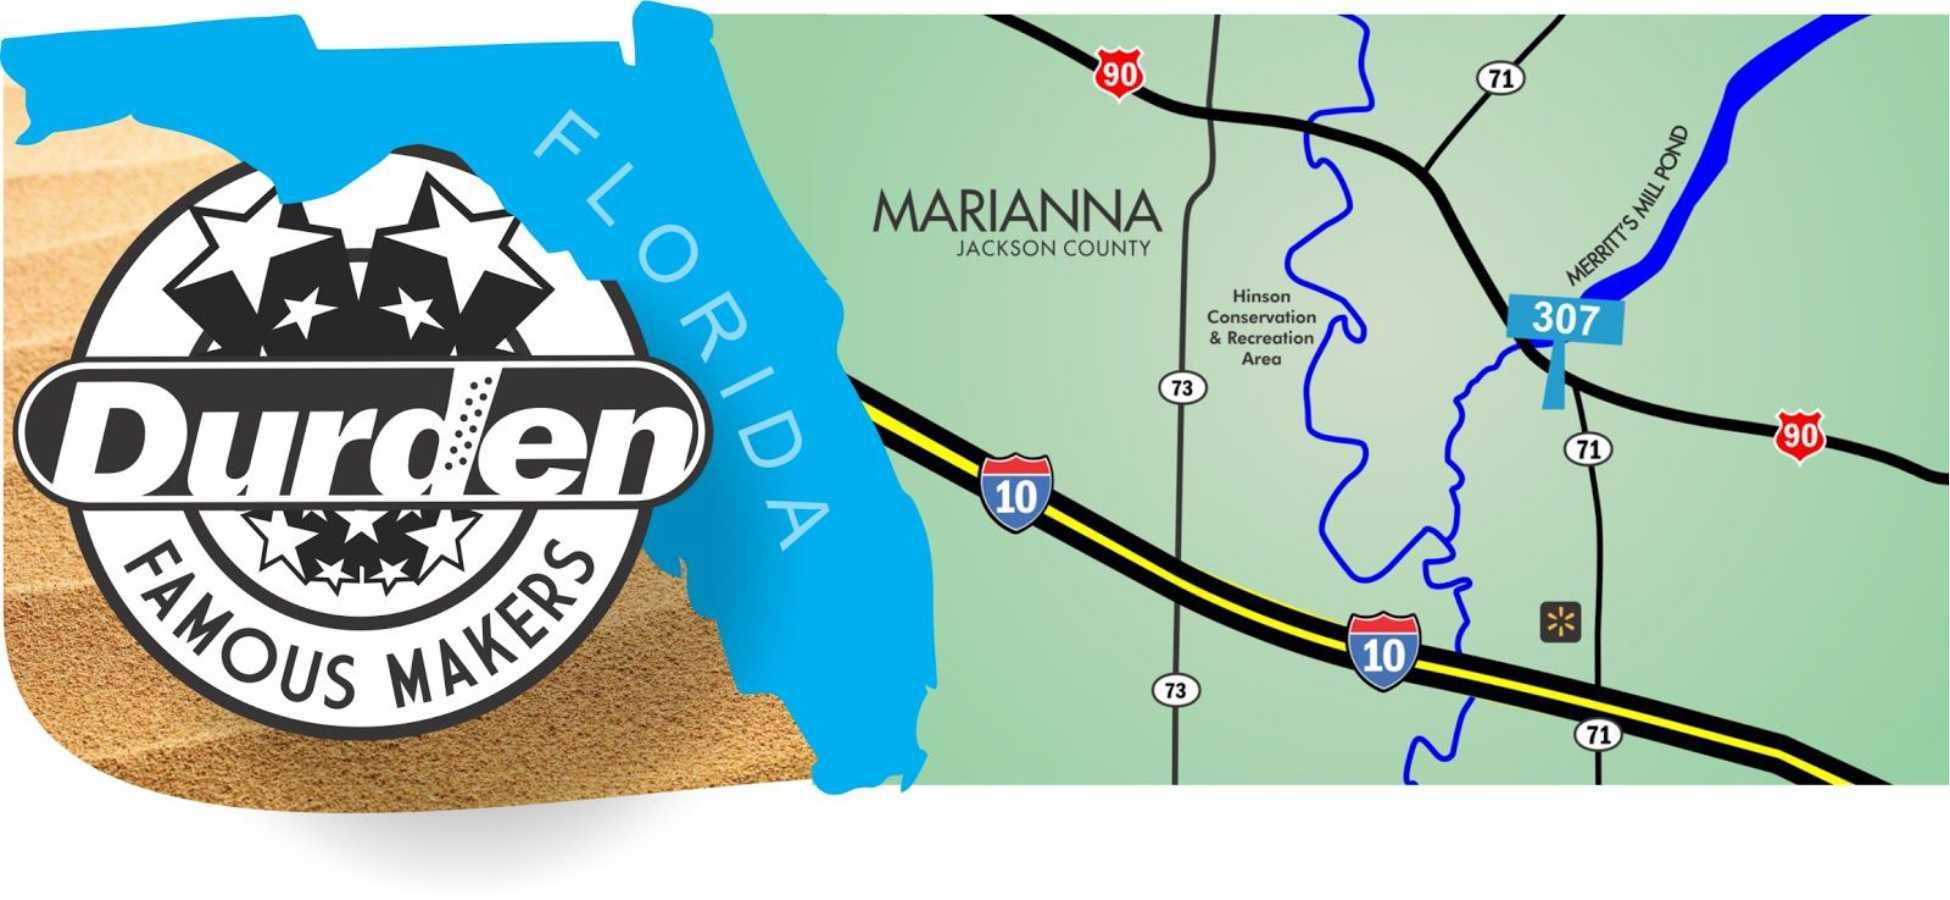 Marianna Florida Map.Durden Outdoor Displays Durden Outdoor Expands Digital Static